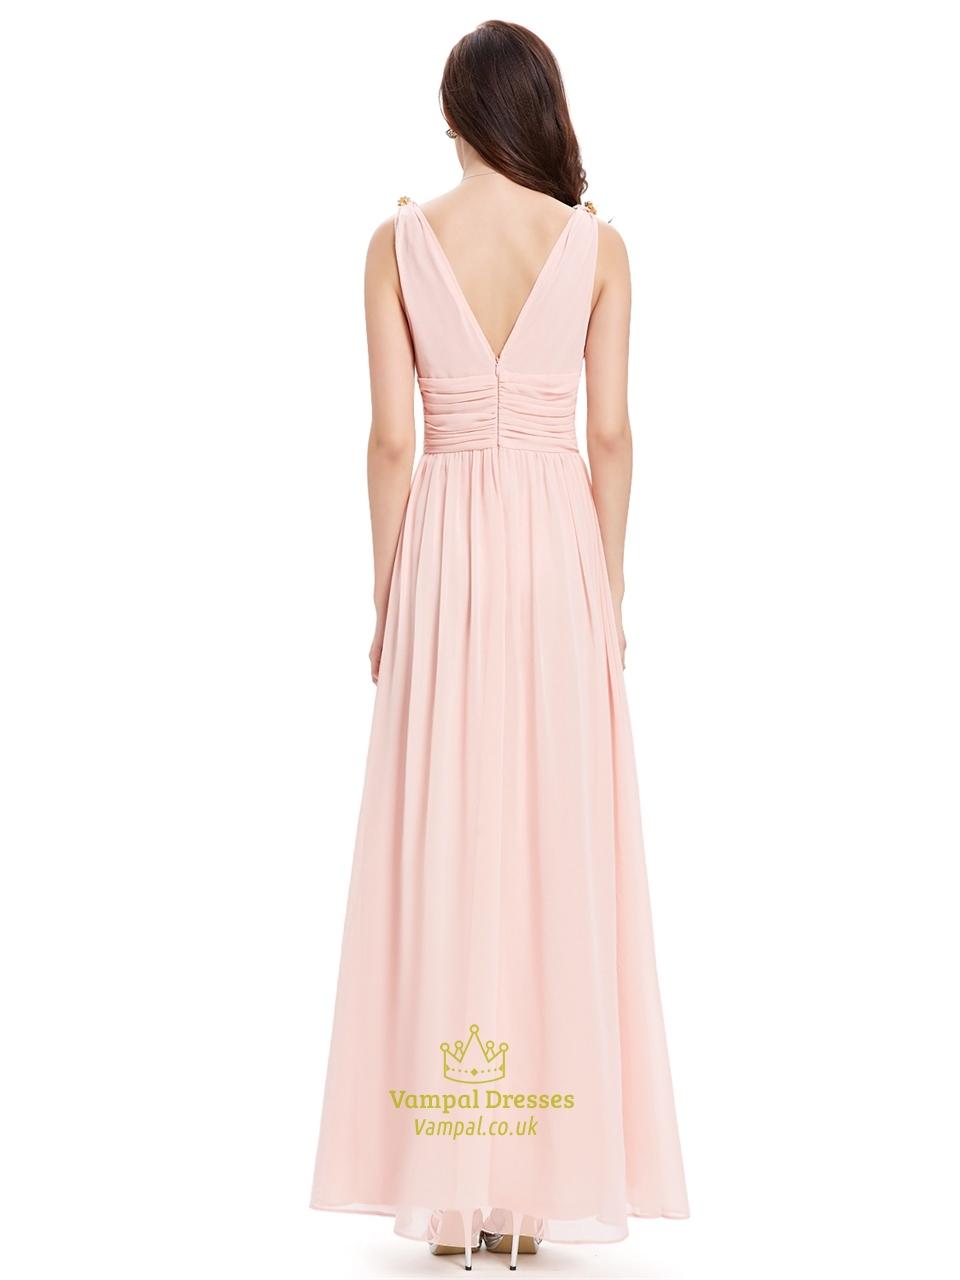 elegant light pink v neck chiffon bridesmaid dress with